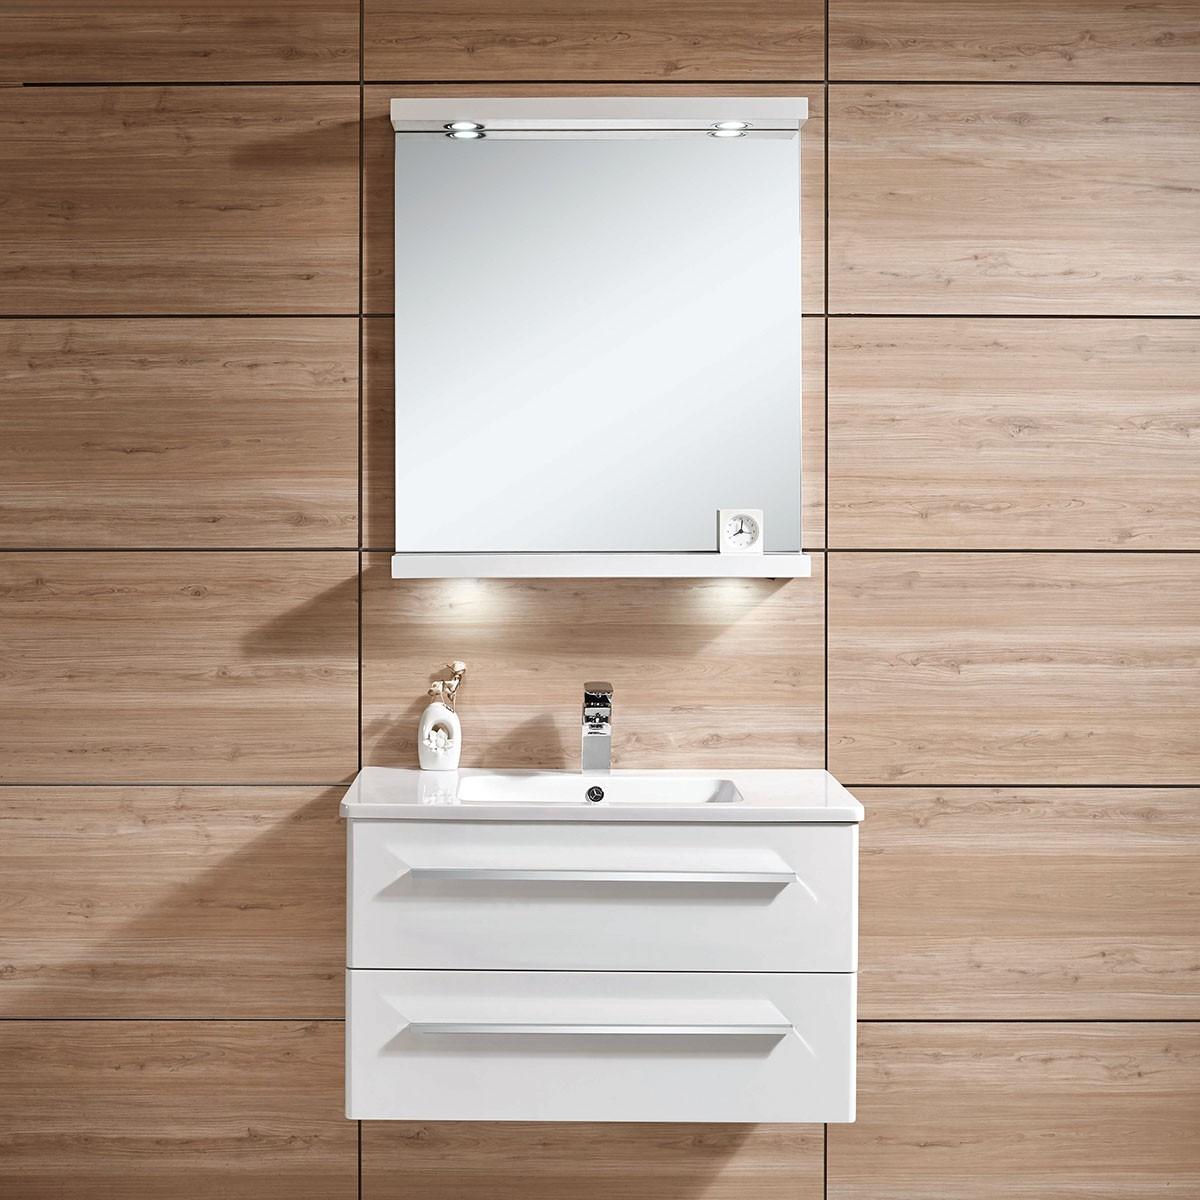 31 In. Wall-Mount Bathroom Vanity Set with Mirror (DK-606800 ...